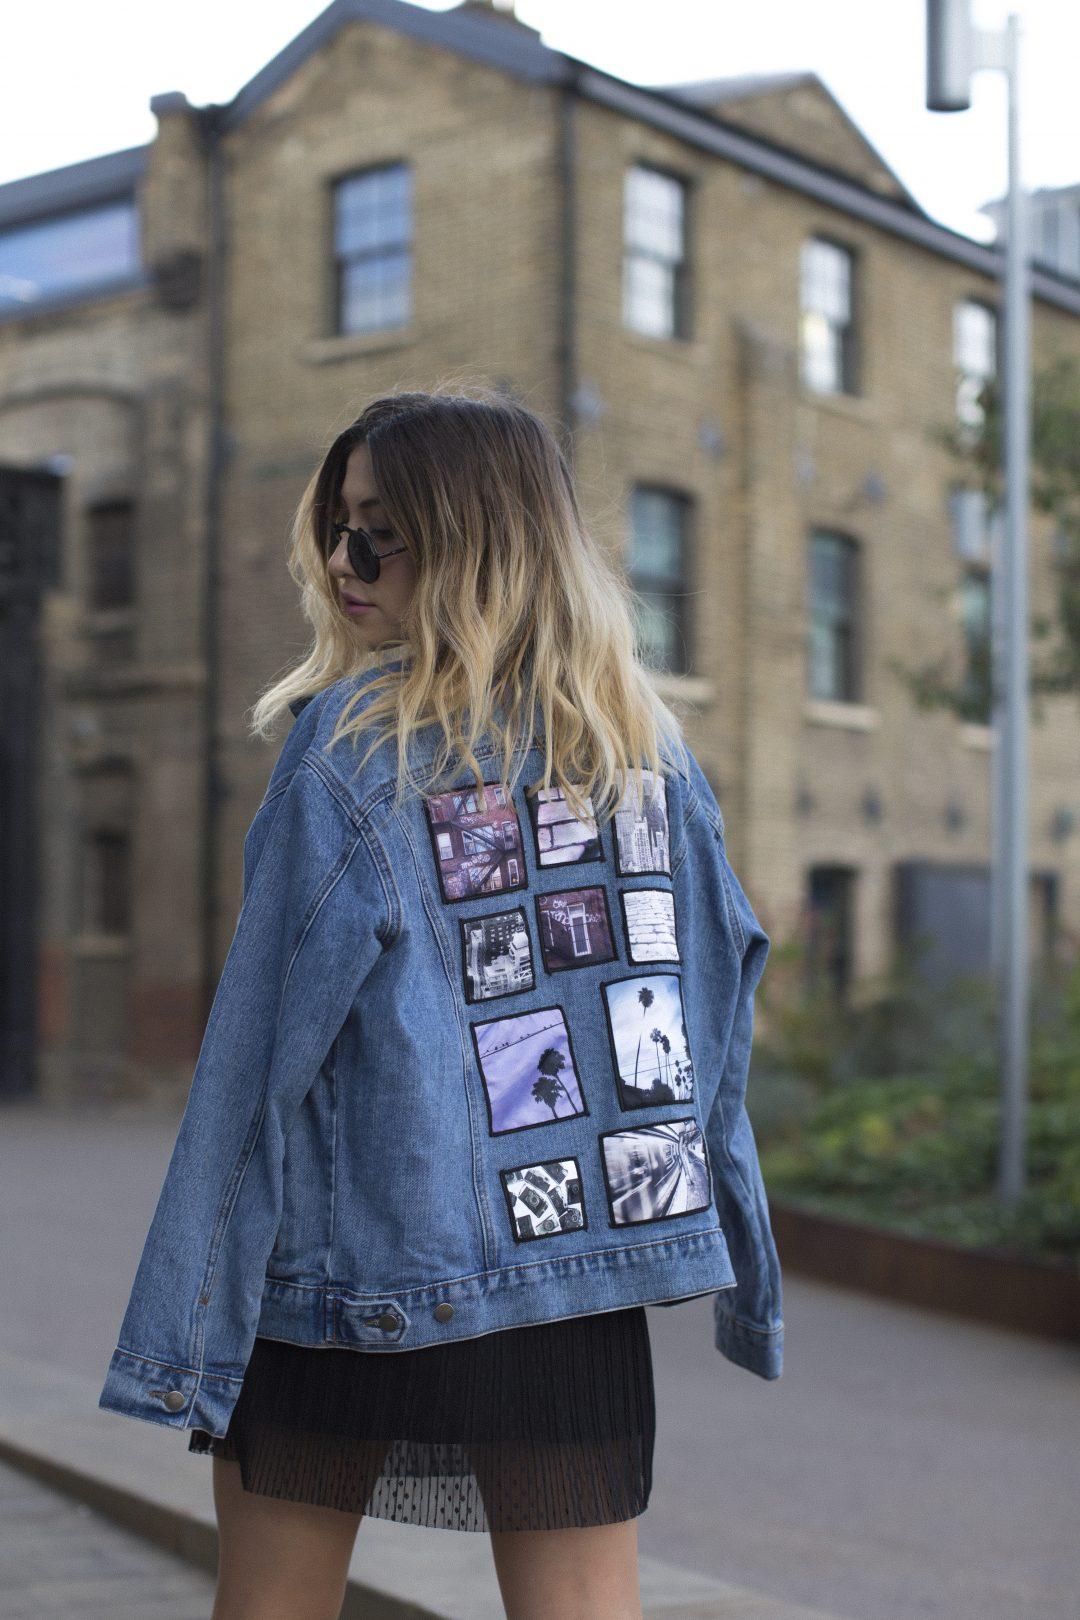 Favorite Denim Jacket For Fall